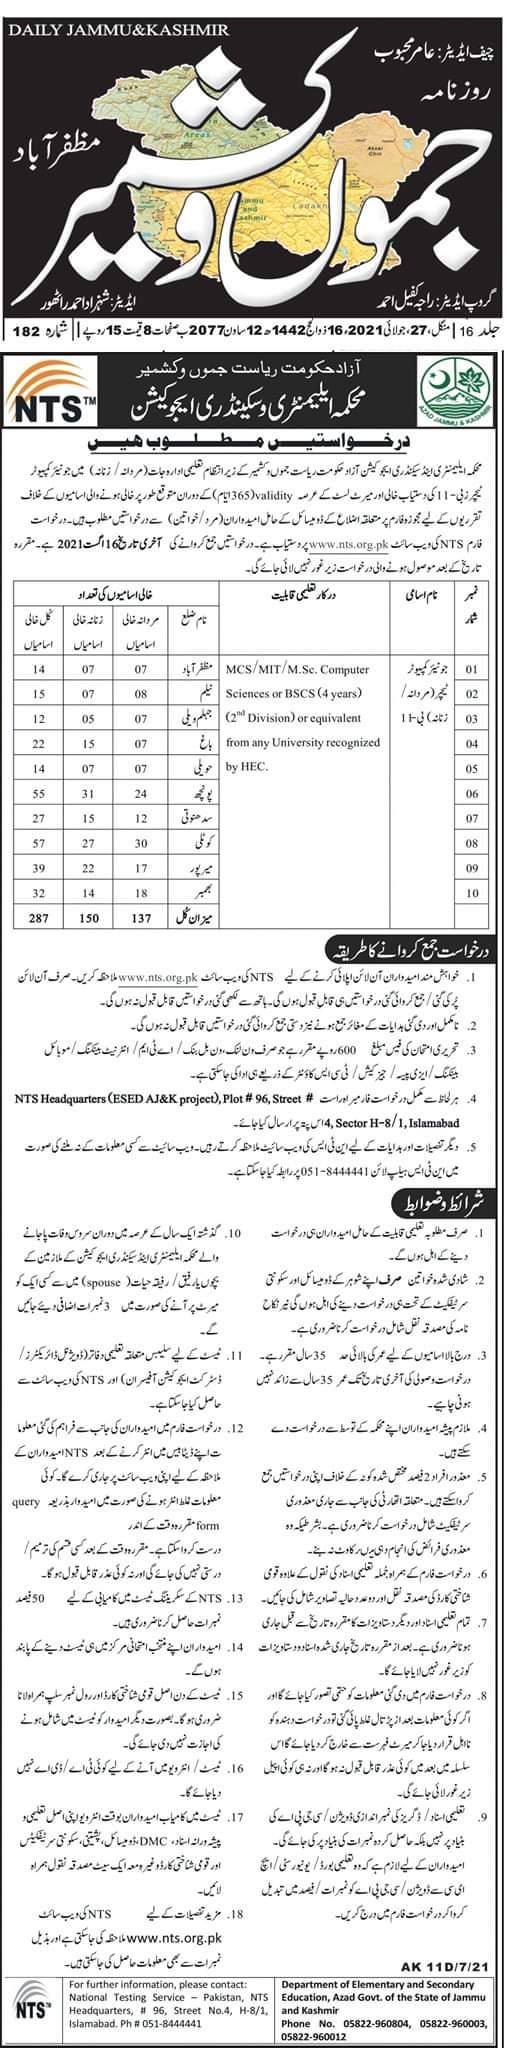 Azad Jammu Kashmir AJK Education Department NTS Jobs Roll Number Slips 2021